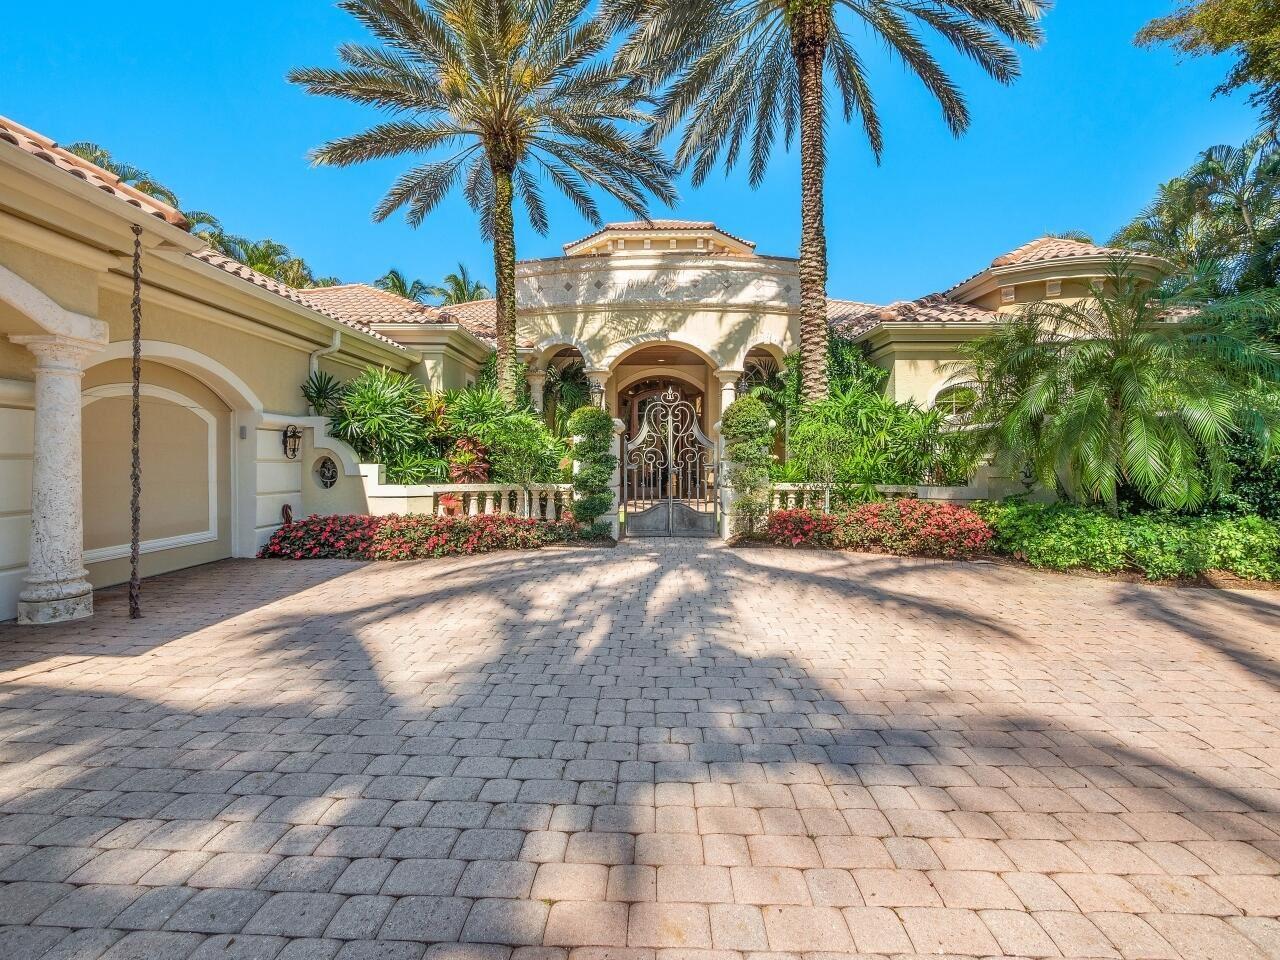 Photo of 29 Saint Thomas Drive, Palm Beach Gardens, FL 33418 (MLS # RX-10706908)